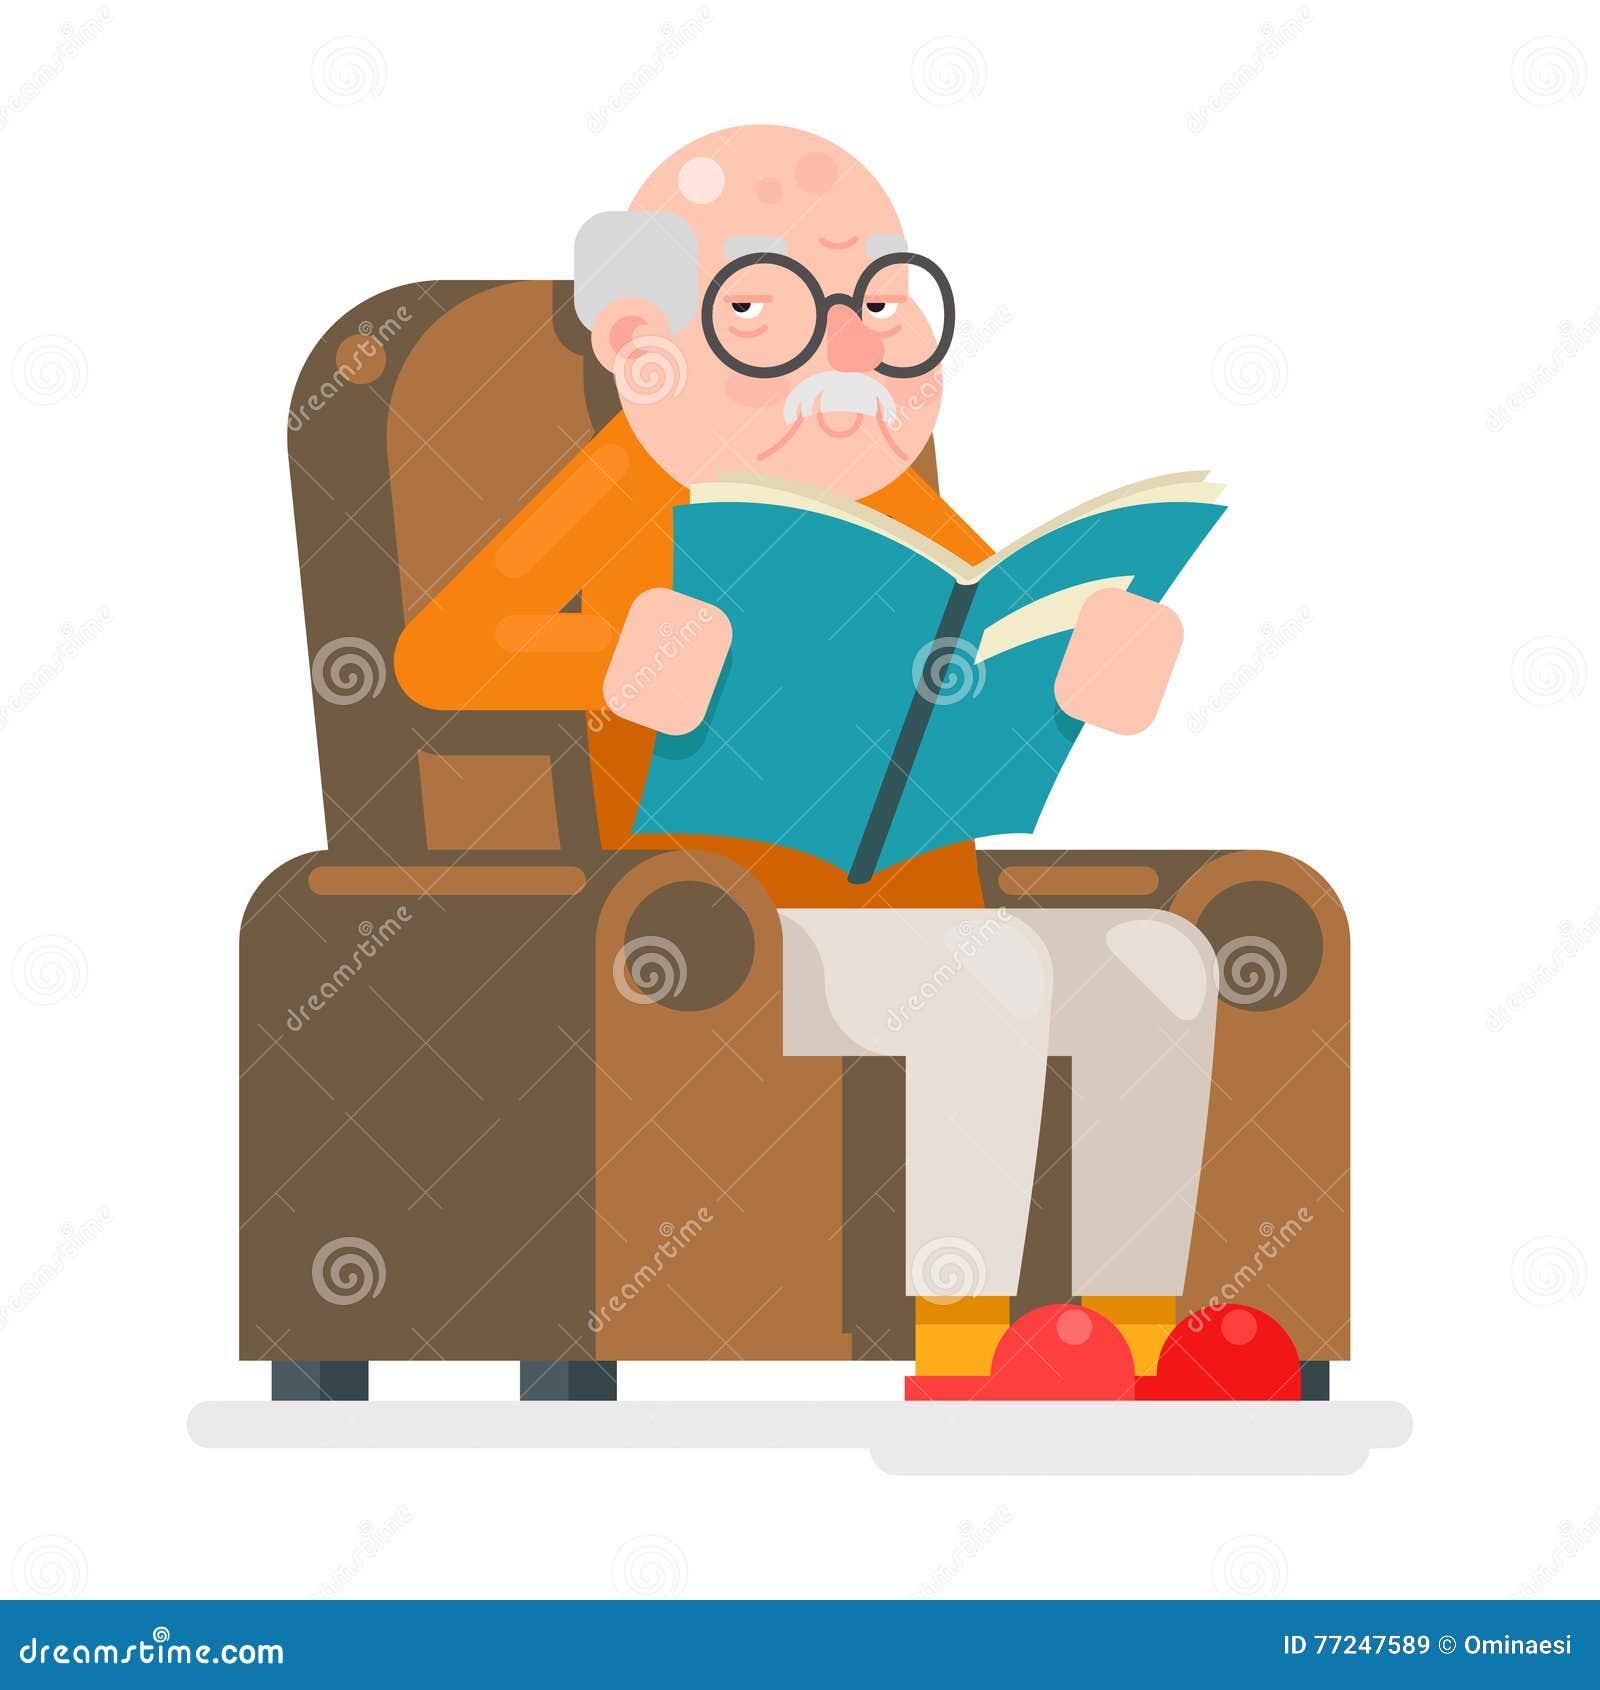 Alter Mann-Charaktere lasen Buch-Sit Chair Adult Icon Flat-Design-Vektor-Illustration